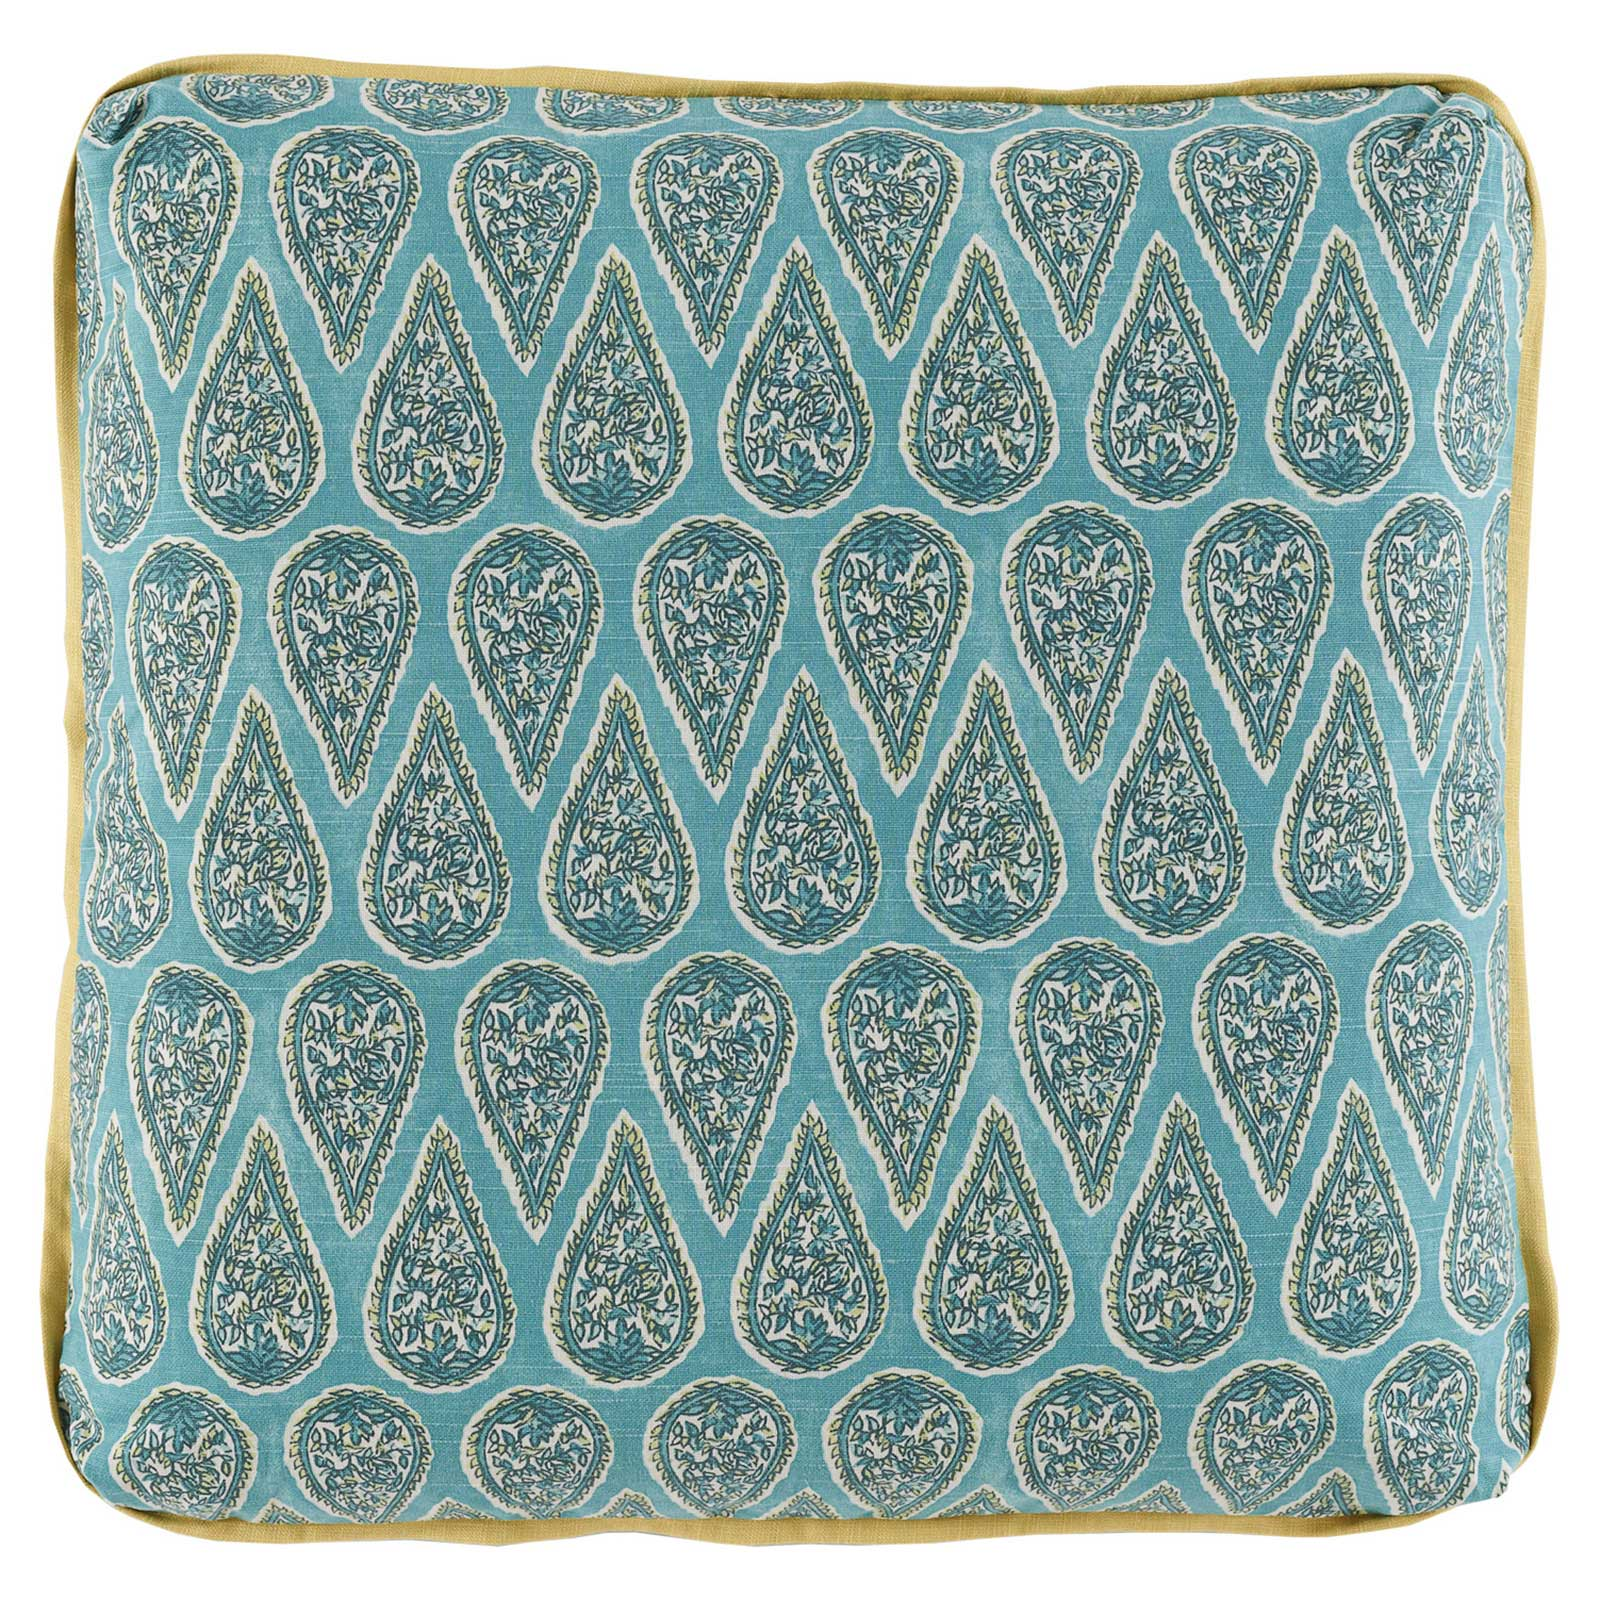 Eleni Global Bazaar Teal Paisley Block Pillow - 24x24